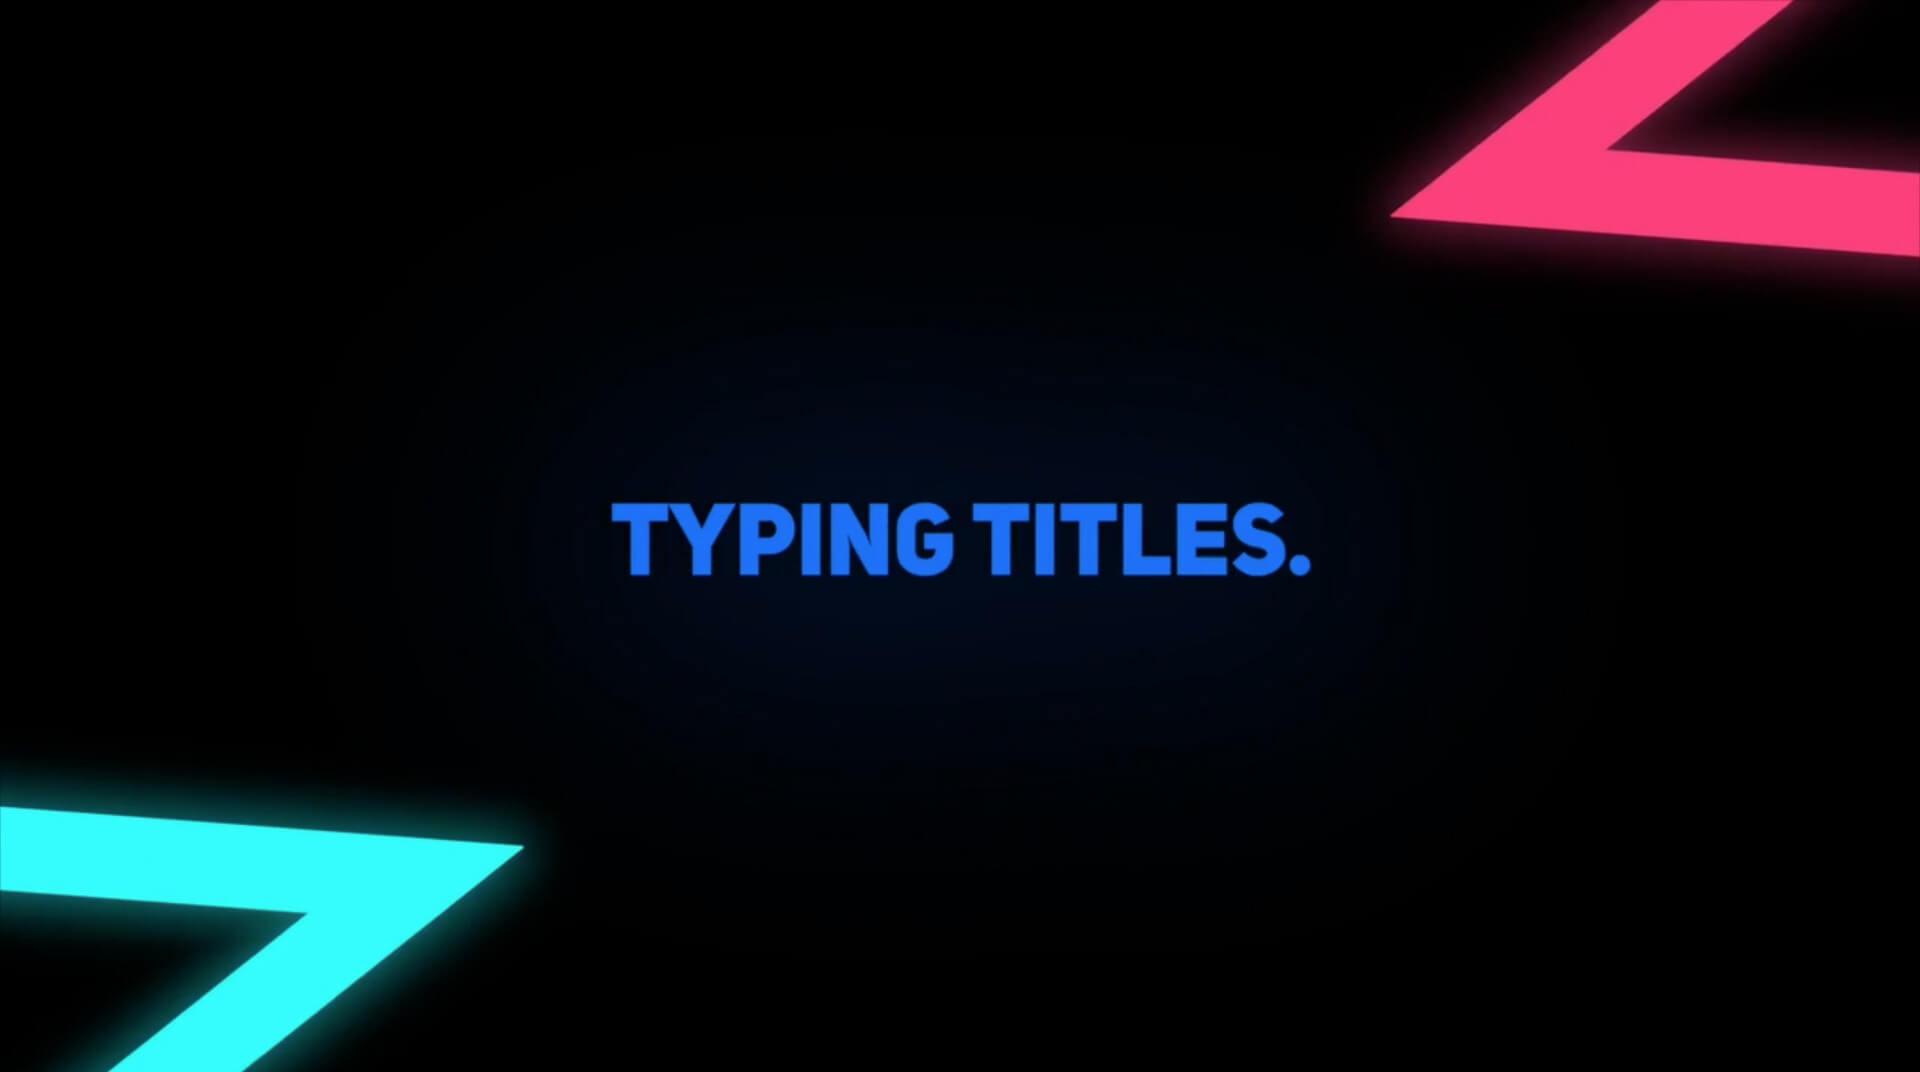 Fcpx插件 24种逐字出现字幕打字机动画效果 Typing Titles X